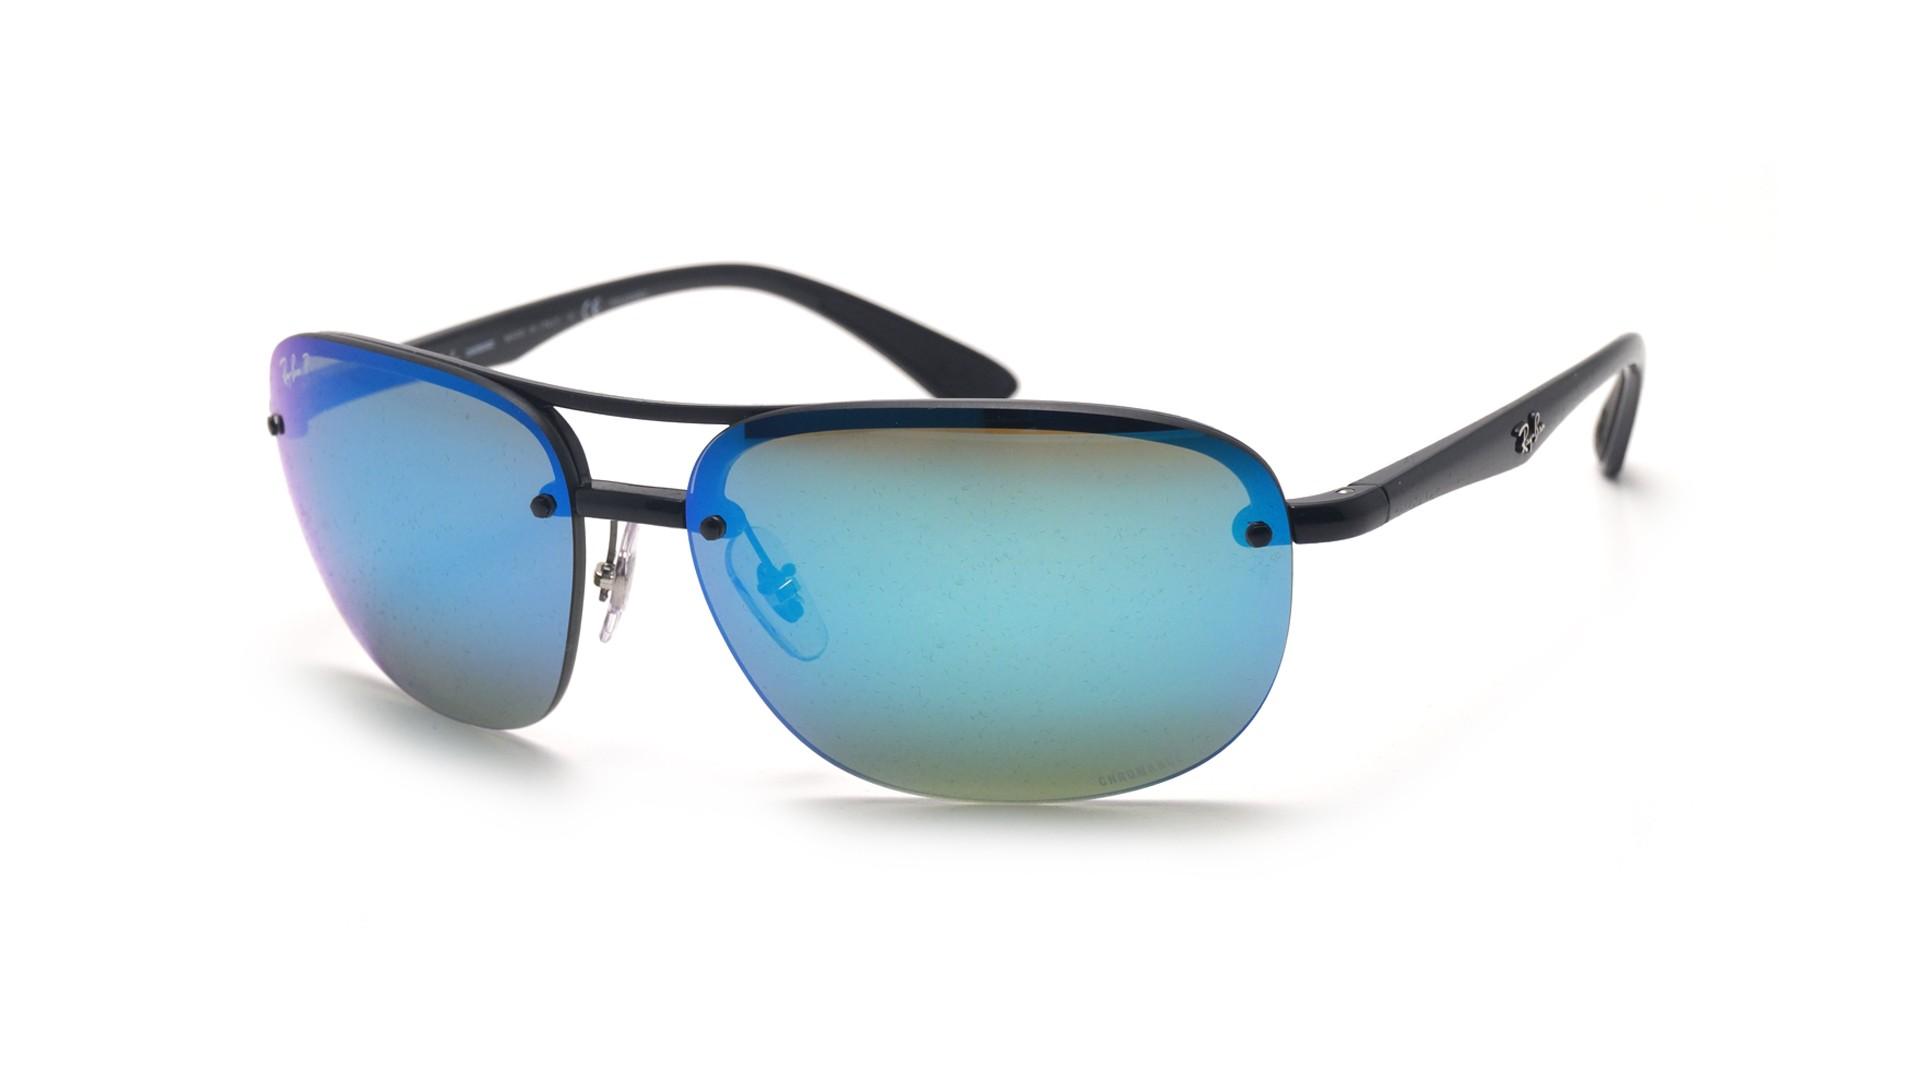 262da9df9c Sunglasses Ray-Ban RB4275CH 601 A1 63-15 Black Chromance Large Polarized  Mirror